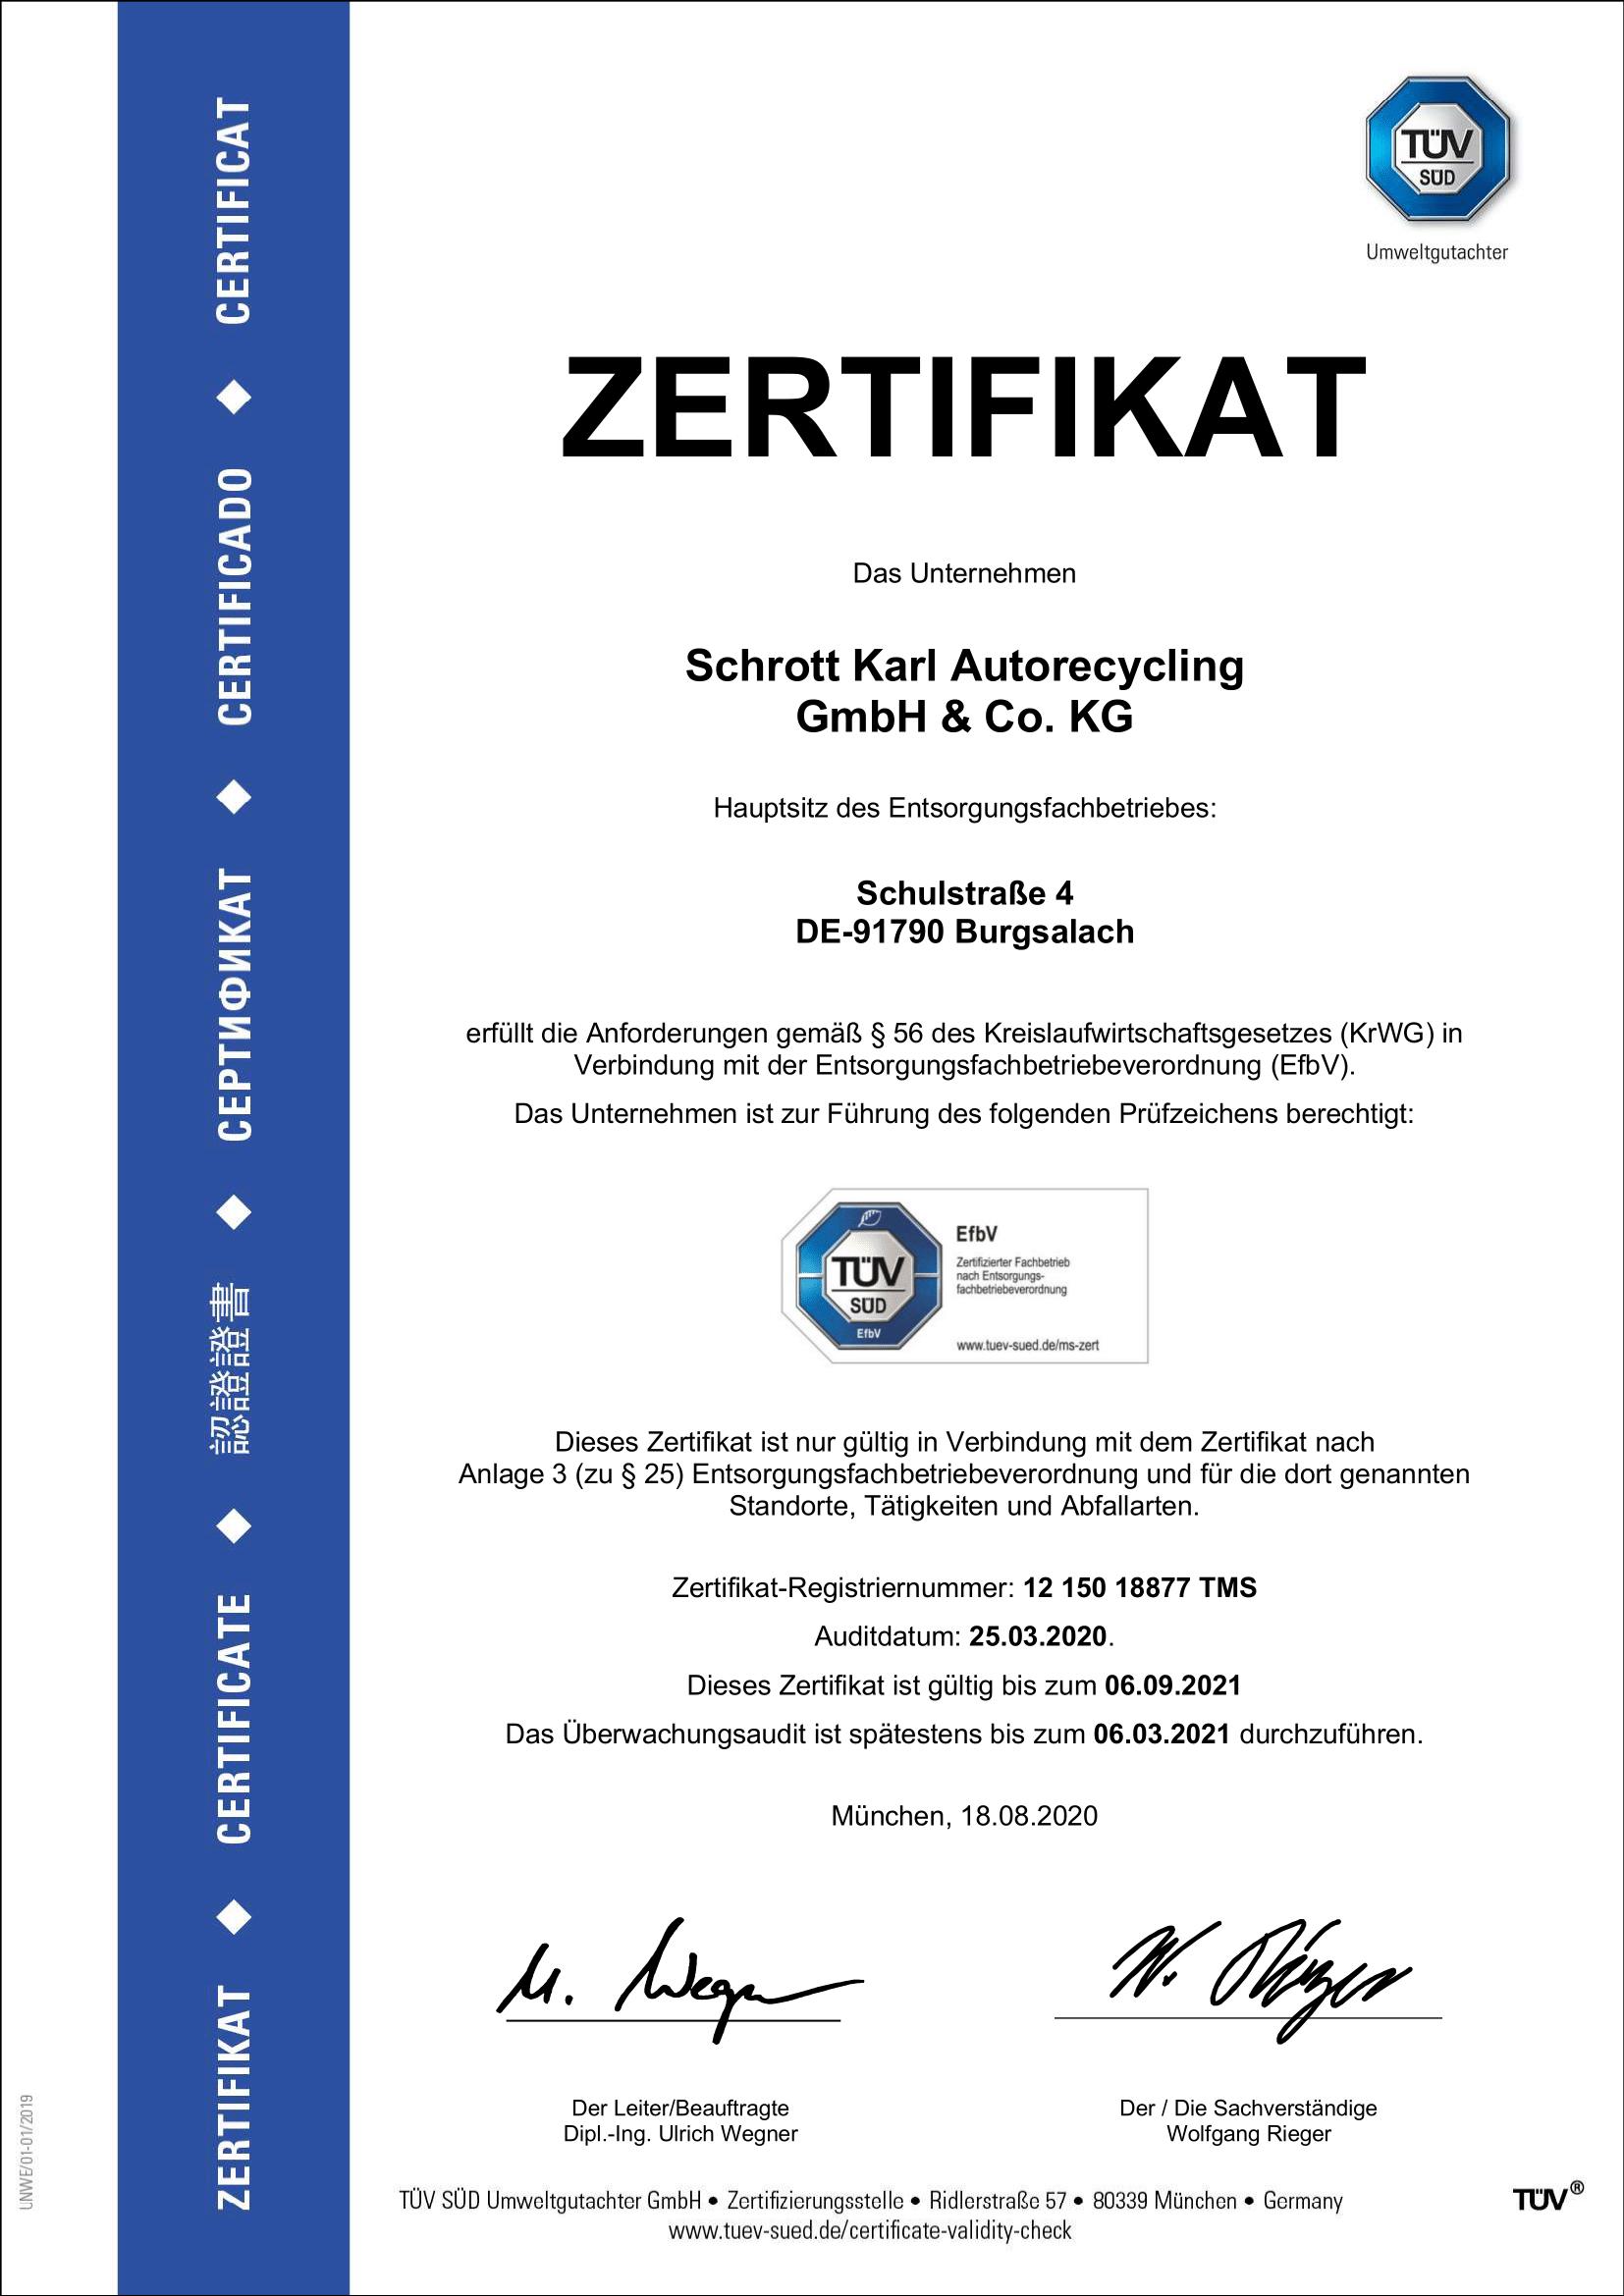 2020-Zertifikat-png